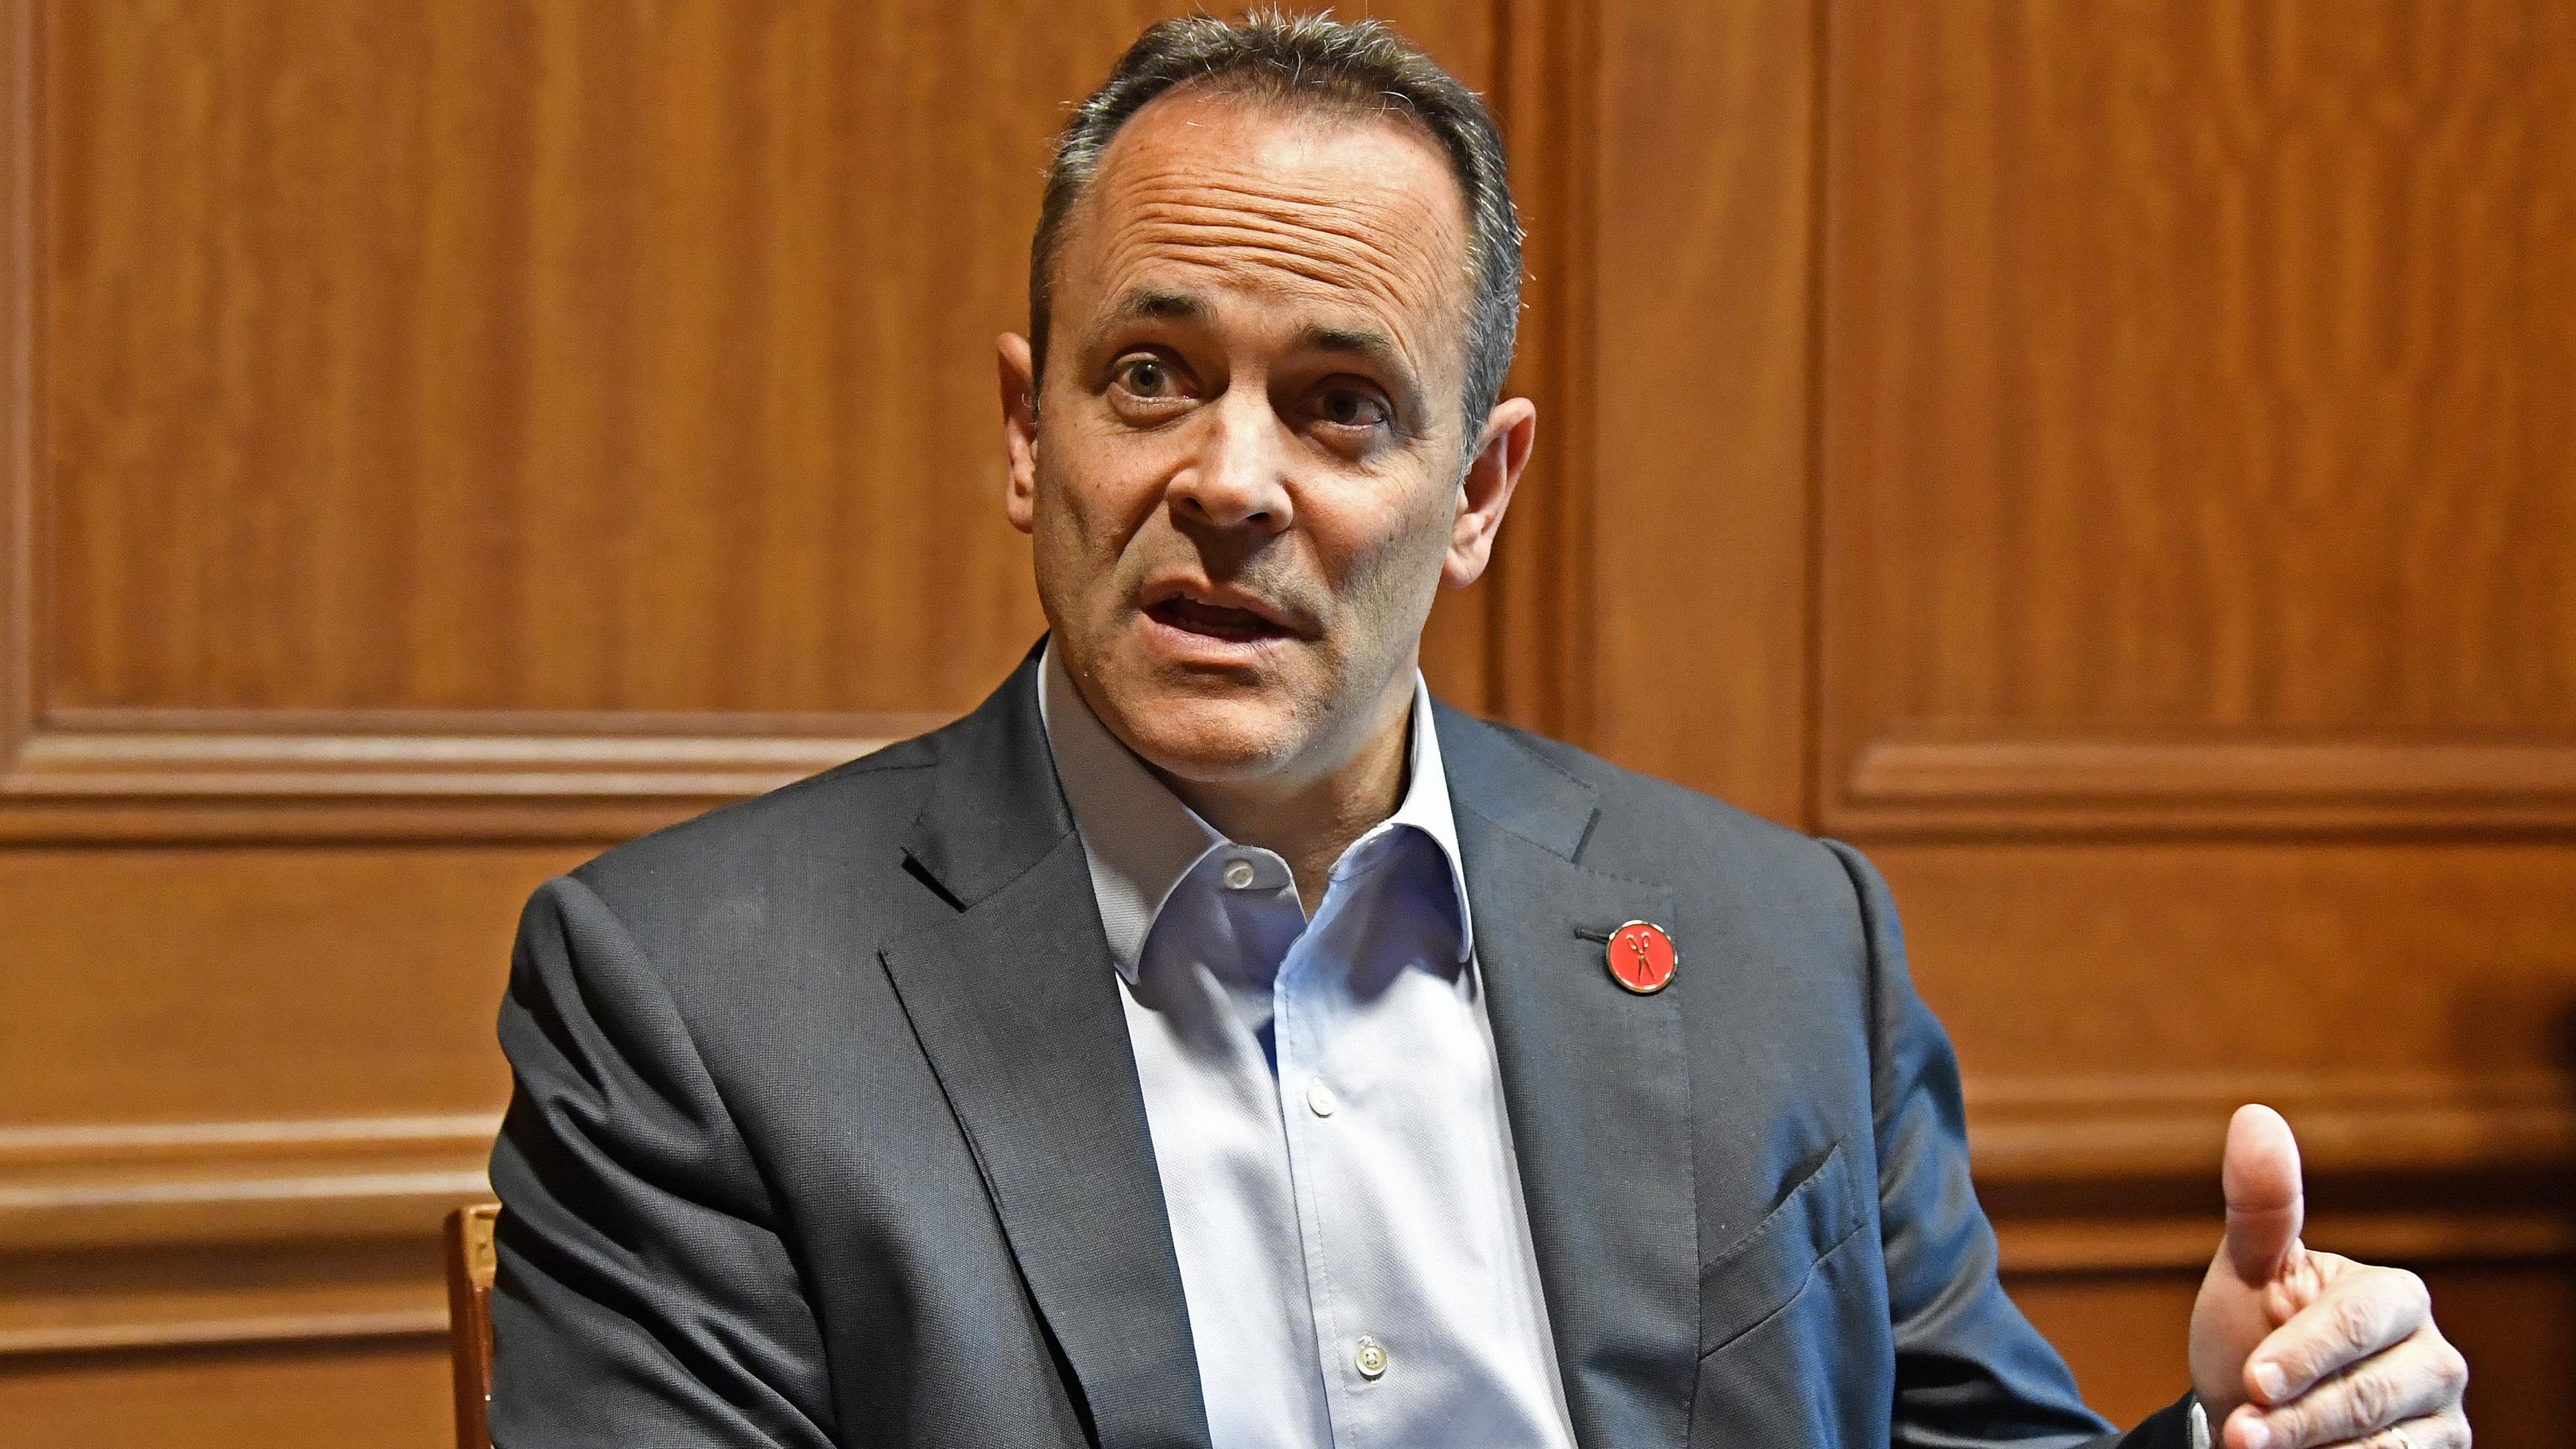 After Recanvass, Kentucky Gov. Matt Bevin Concedes Race To Democrat Andy Beshear